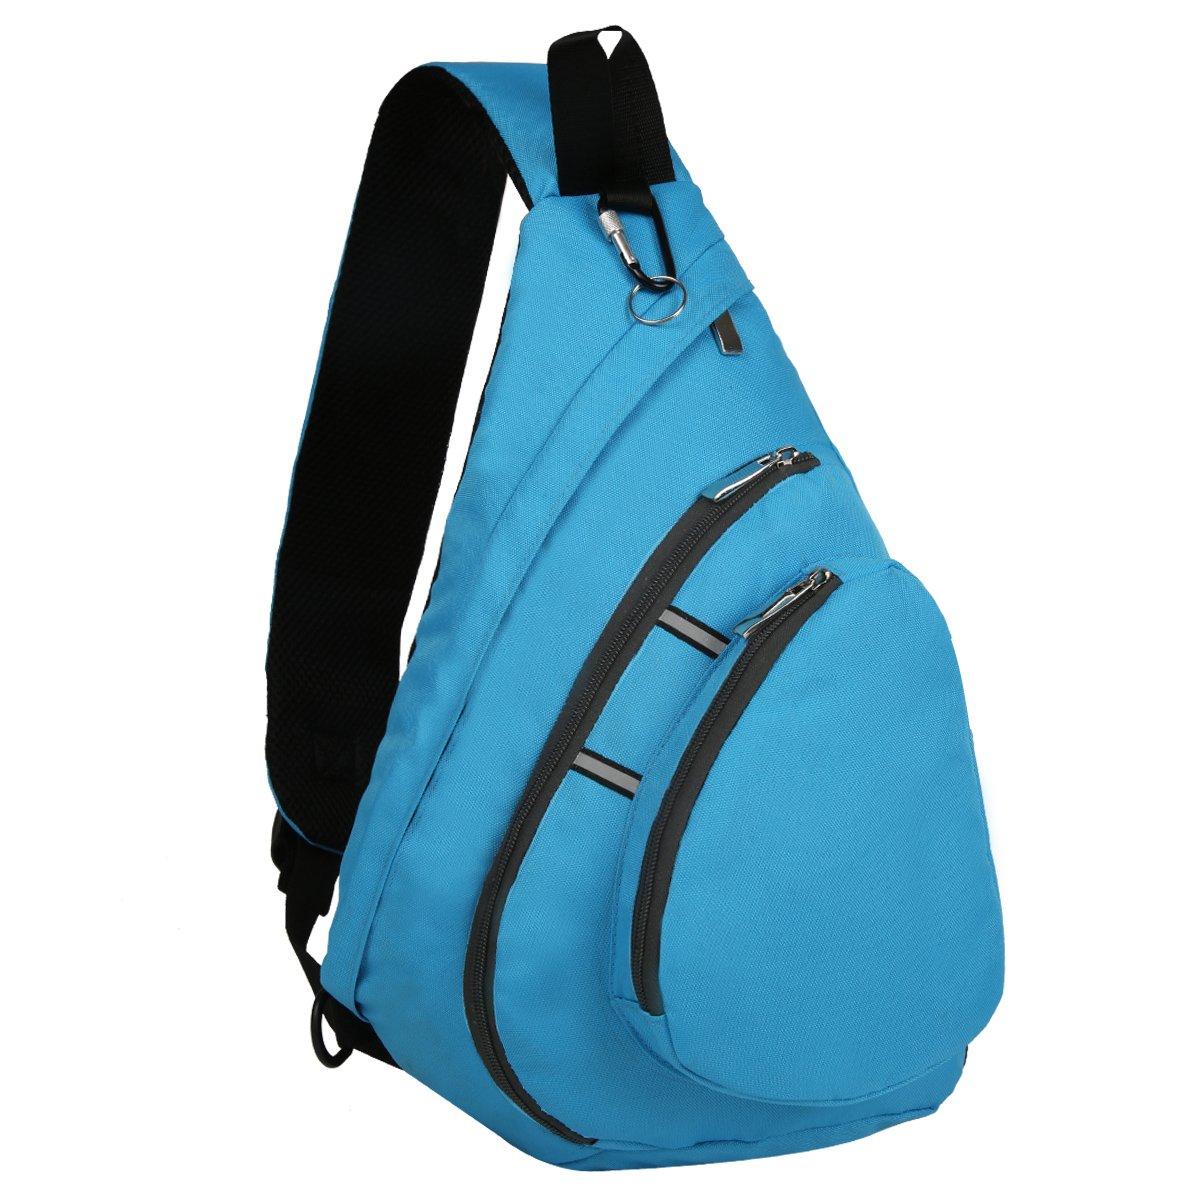 Bekahizar Sling Backpack Bag Crossbody One Shoulder Day Bag Chest Shoulder Pack for Men Women Outdoor Sports Hiking Travel and Day Trips (Blue)